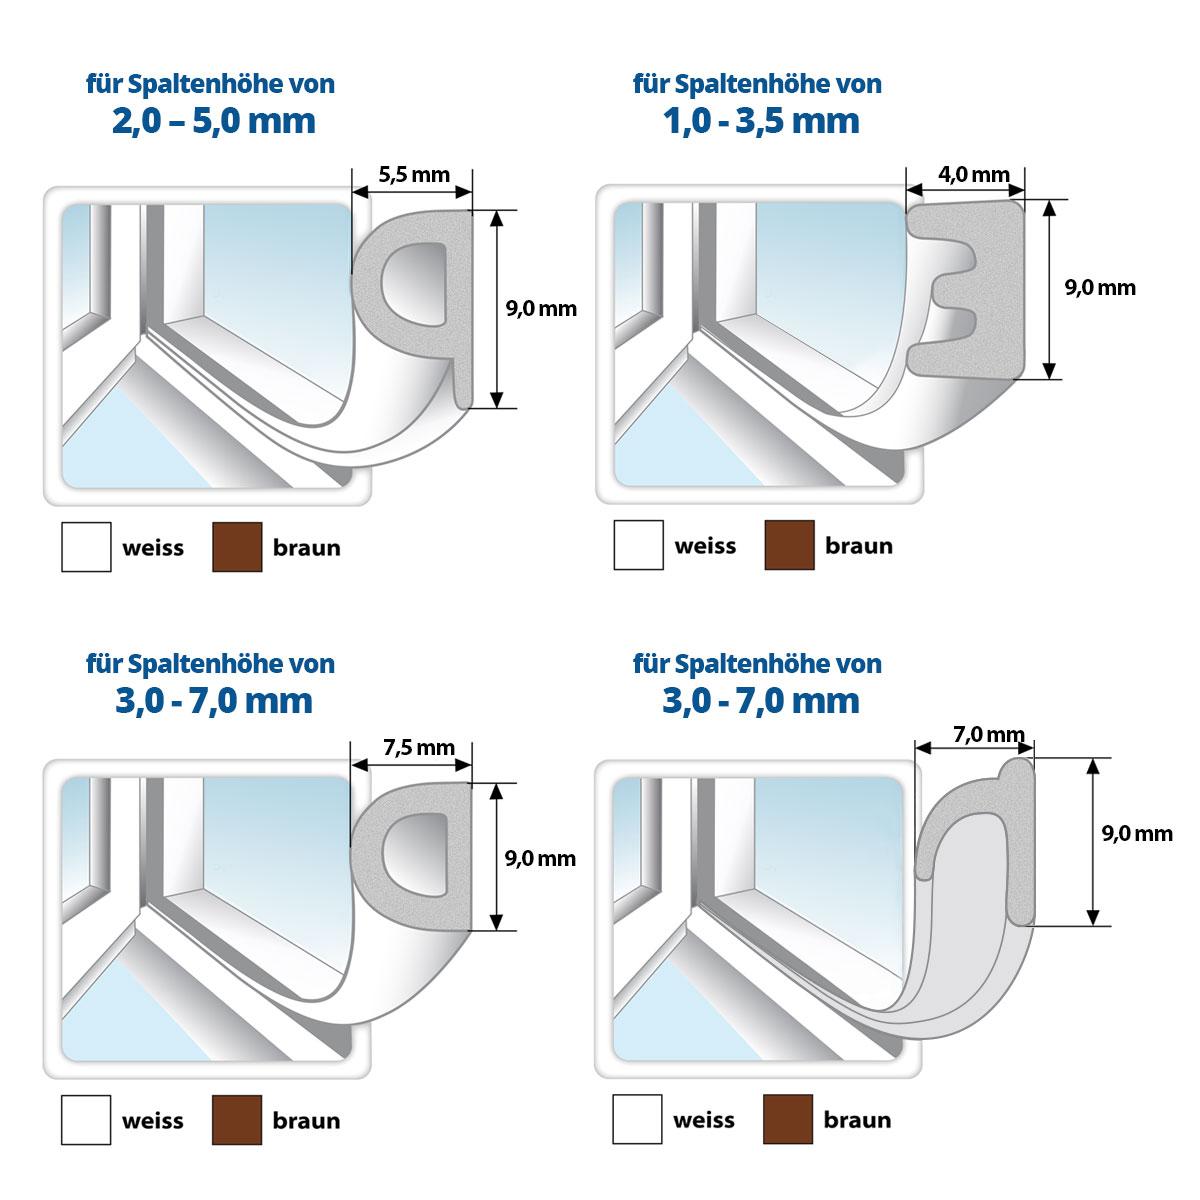 gummidichtung fensterdichtung t rdichtung selbstklebend epdm dichtungsprofil ebay. Black Bedroom Furniture Sets. Home Design Ideas